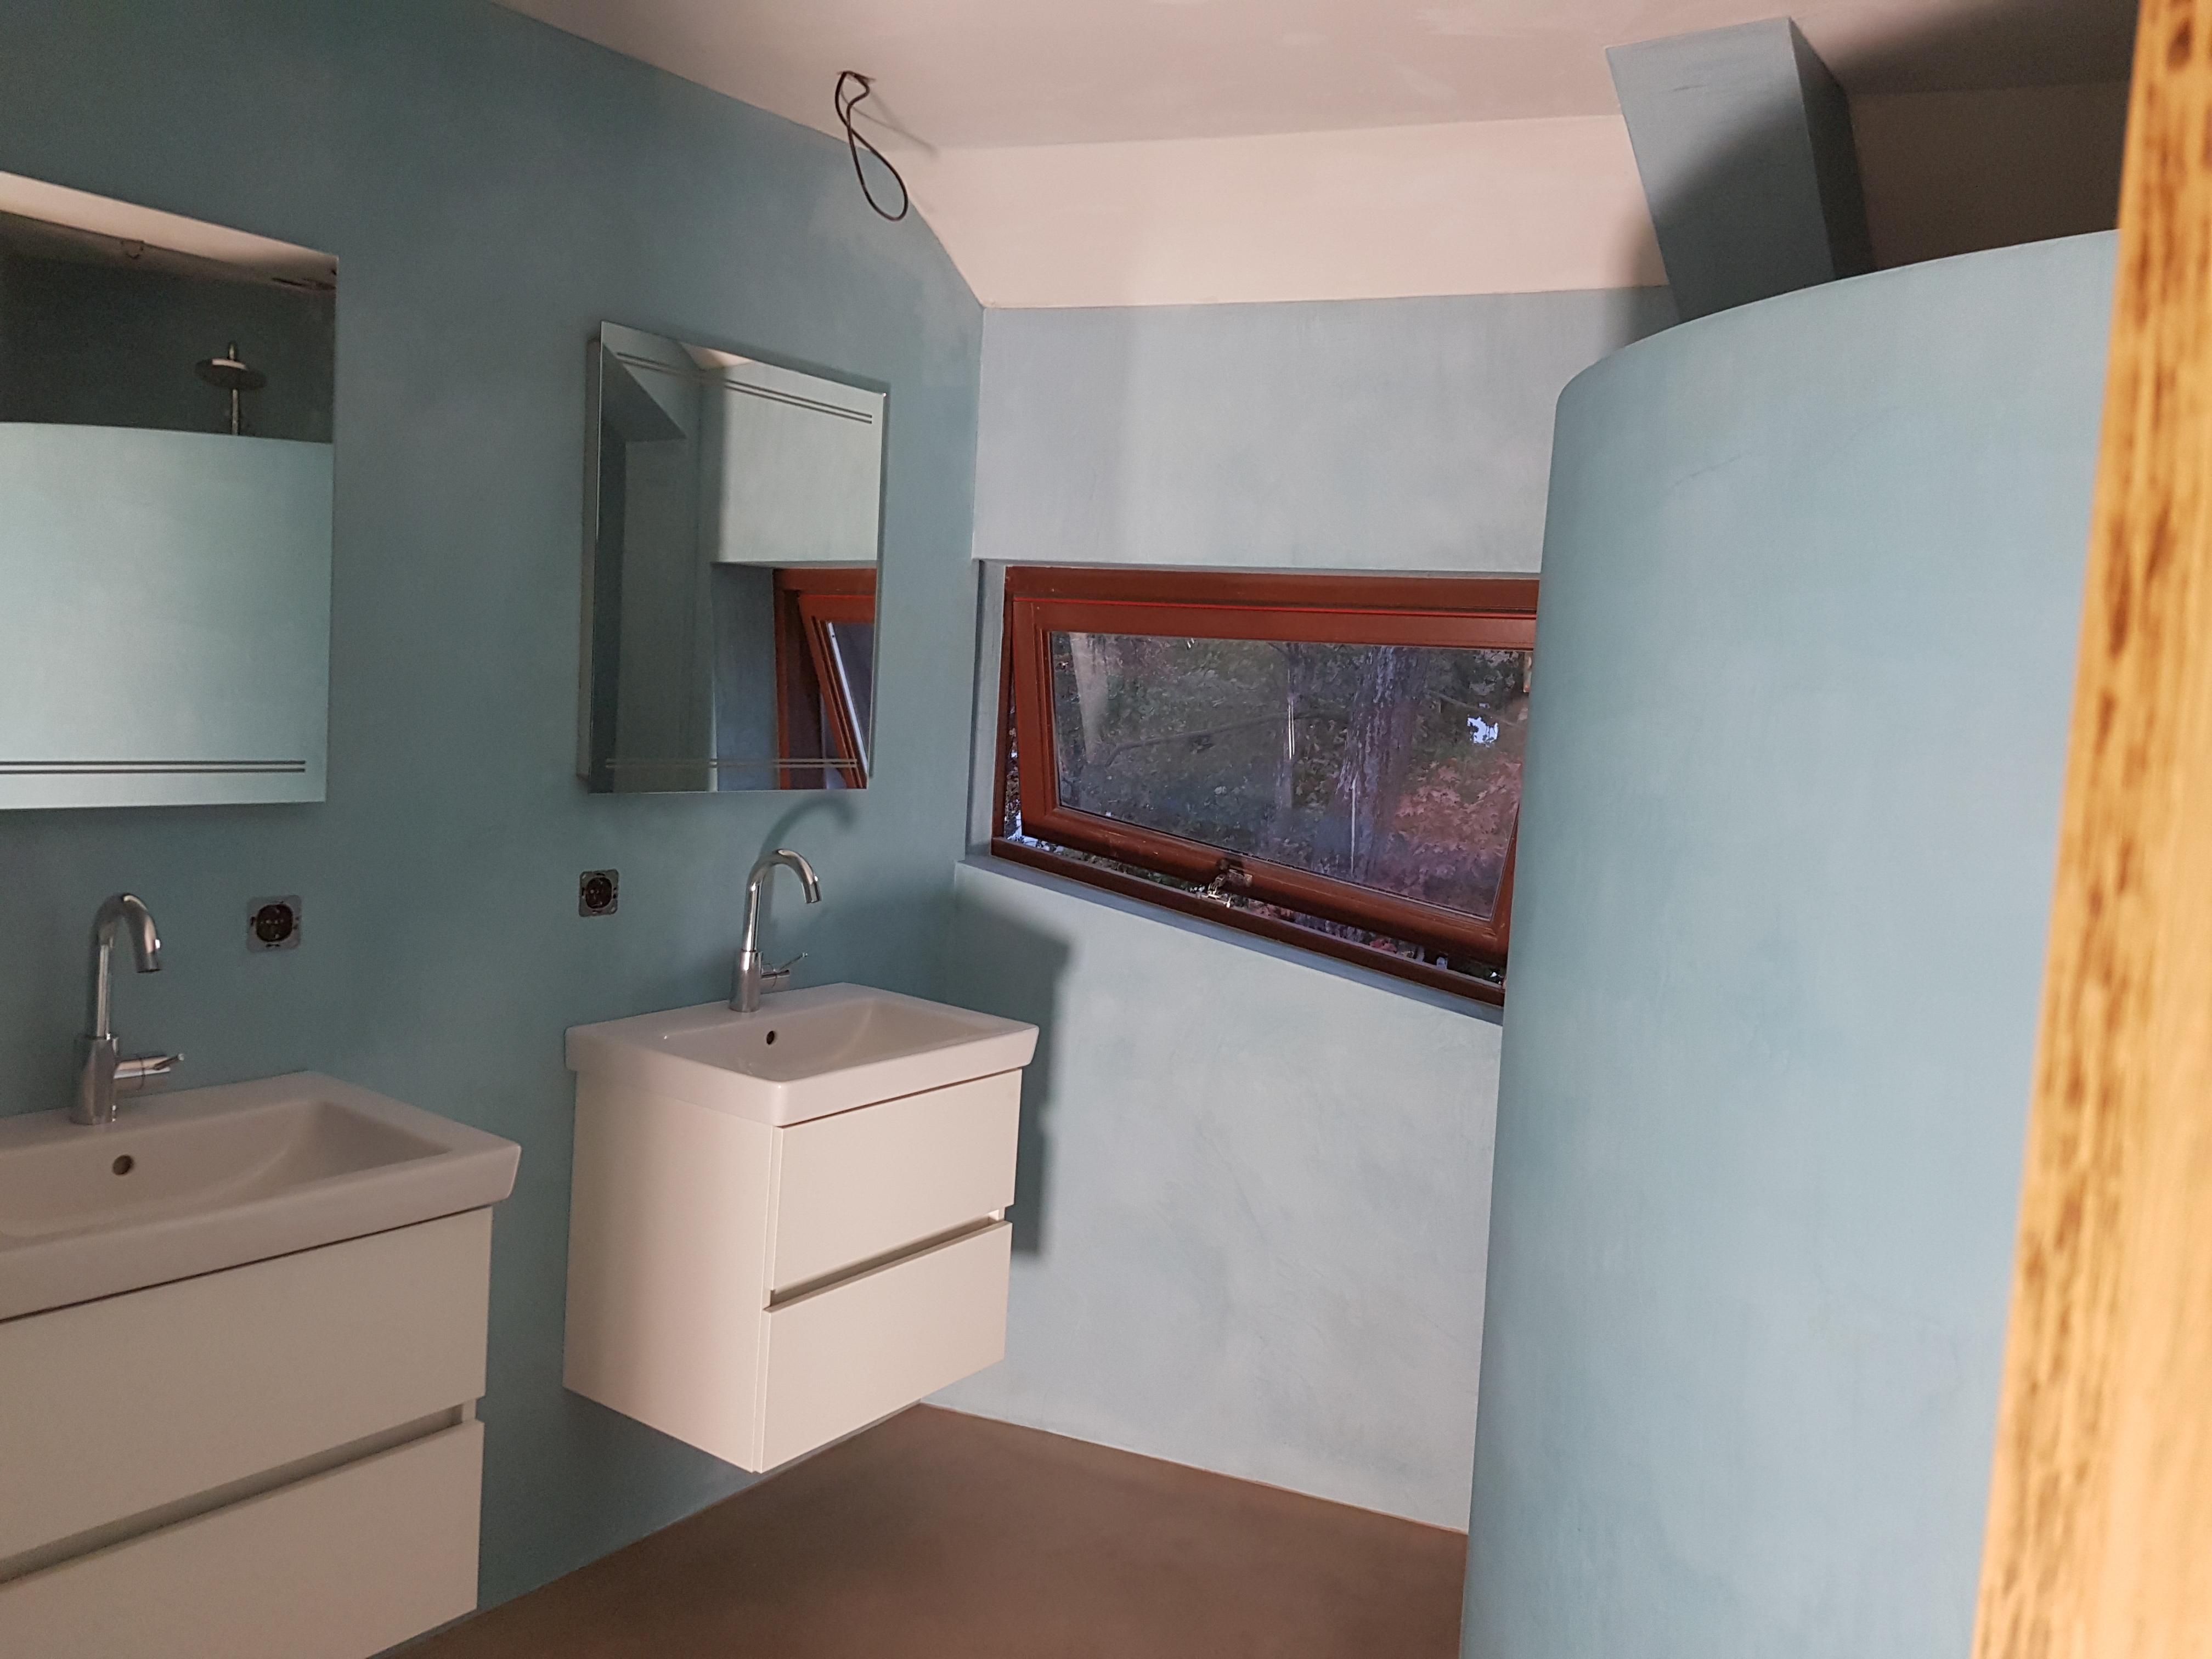 Beton Cire Waterdicht : Houten vloer badkamer waterdicht maken unique beton cire badkamer